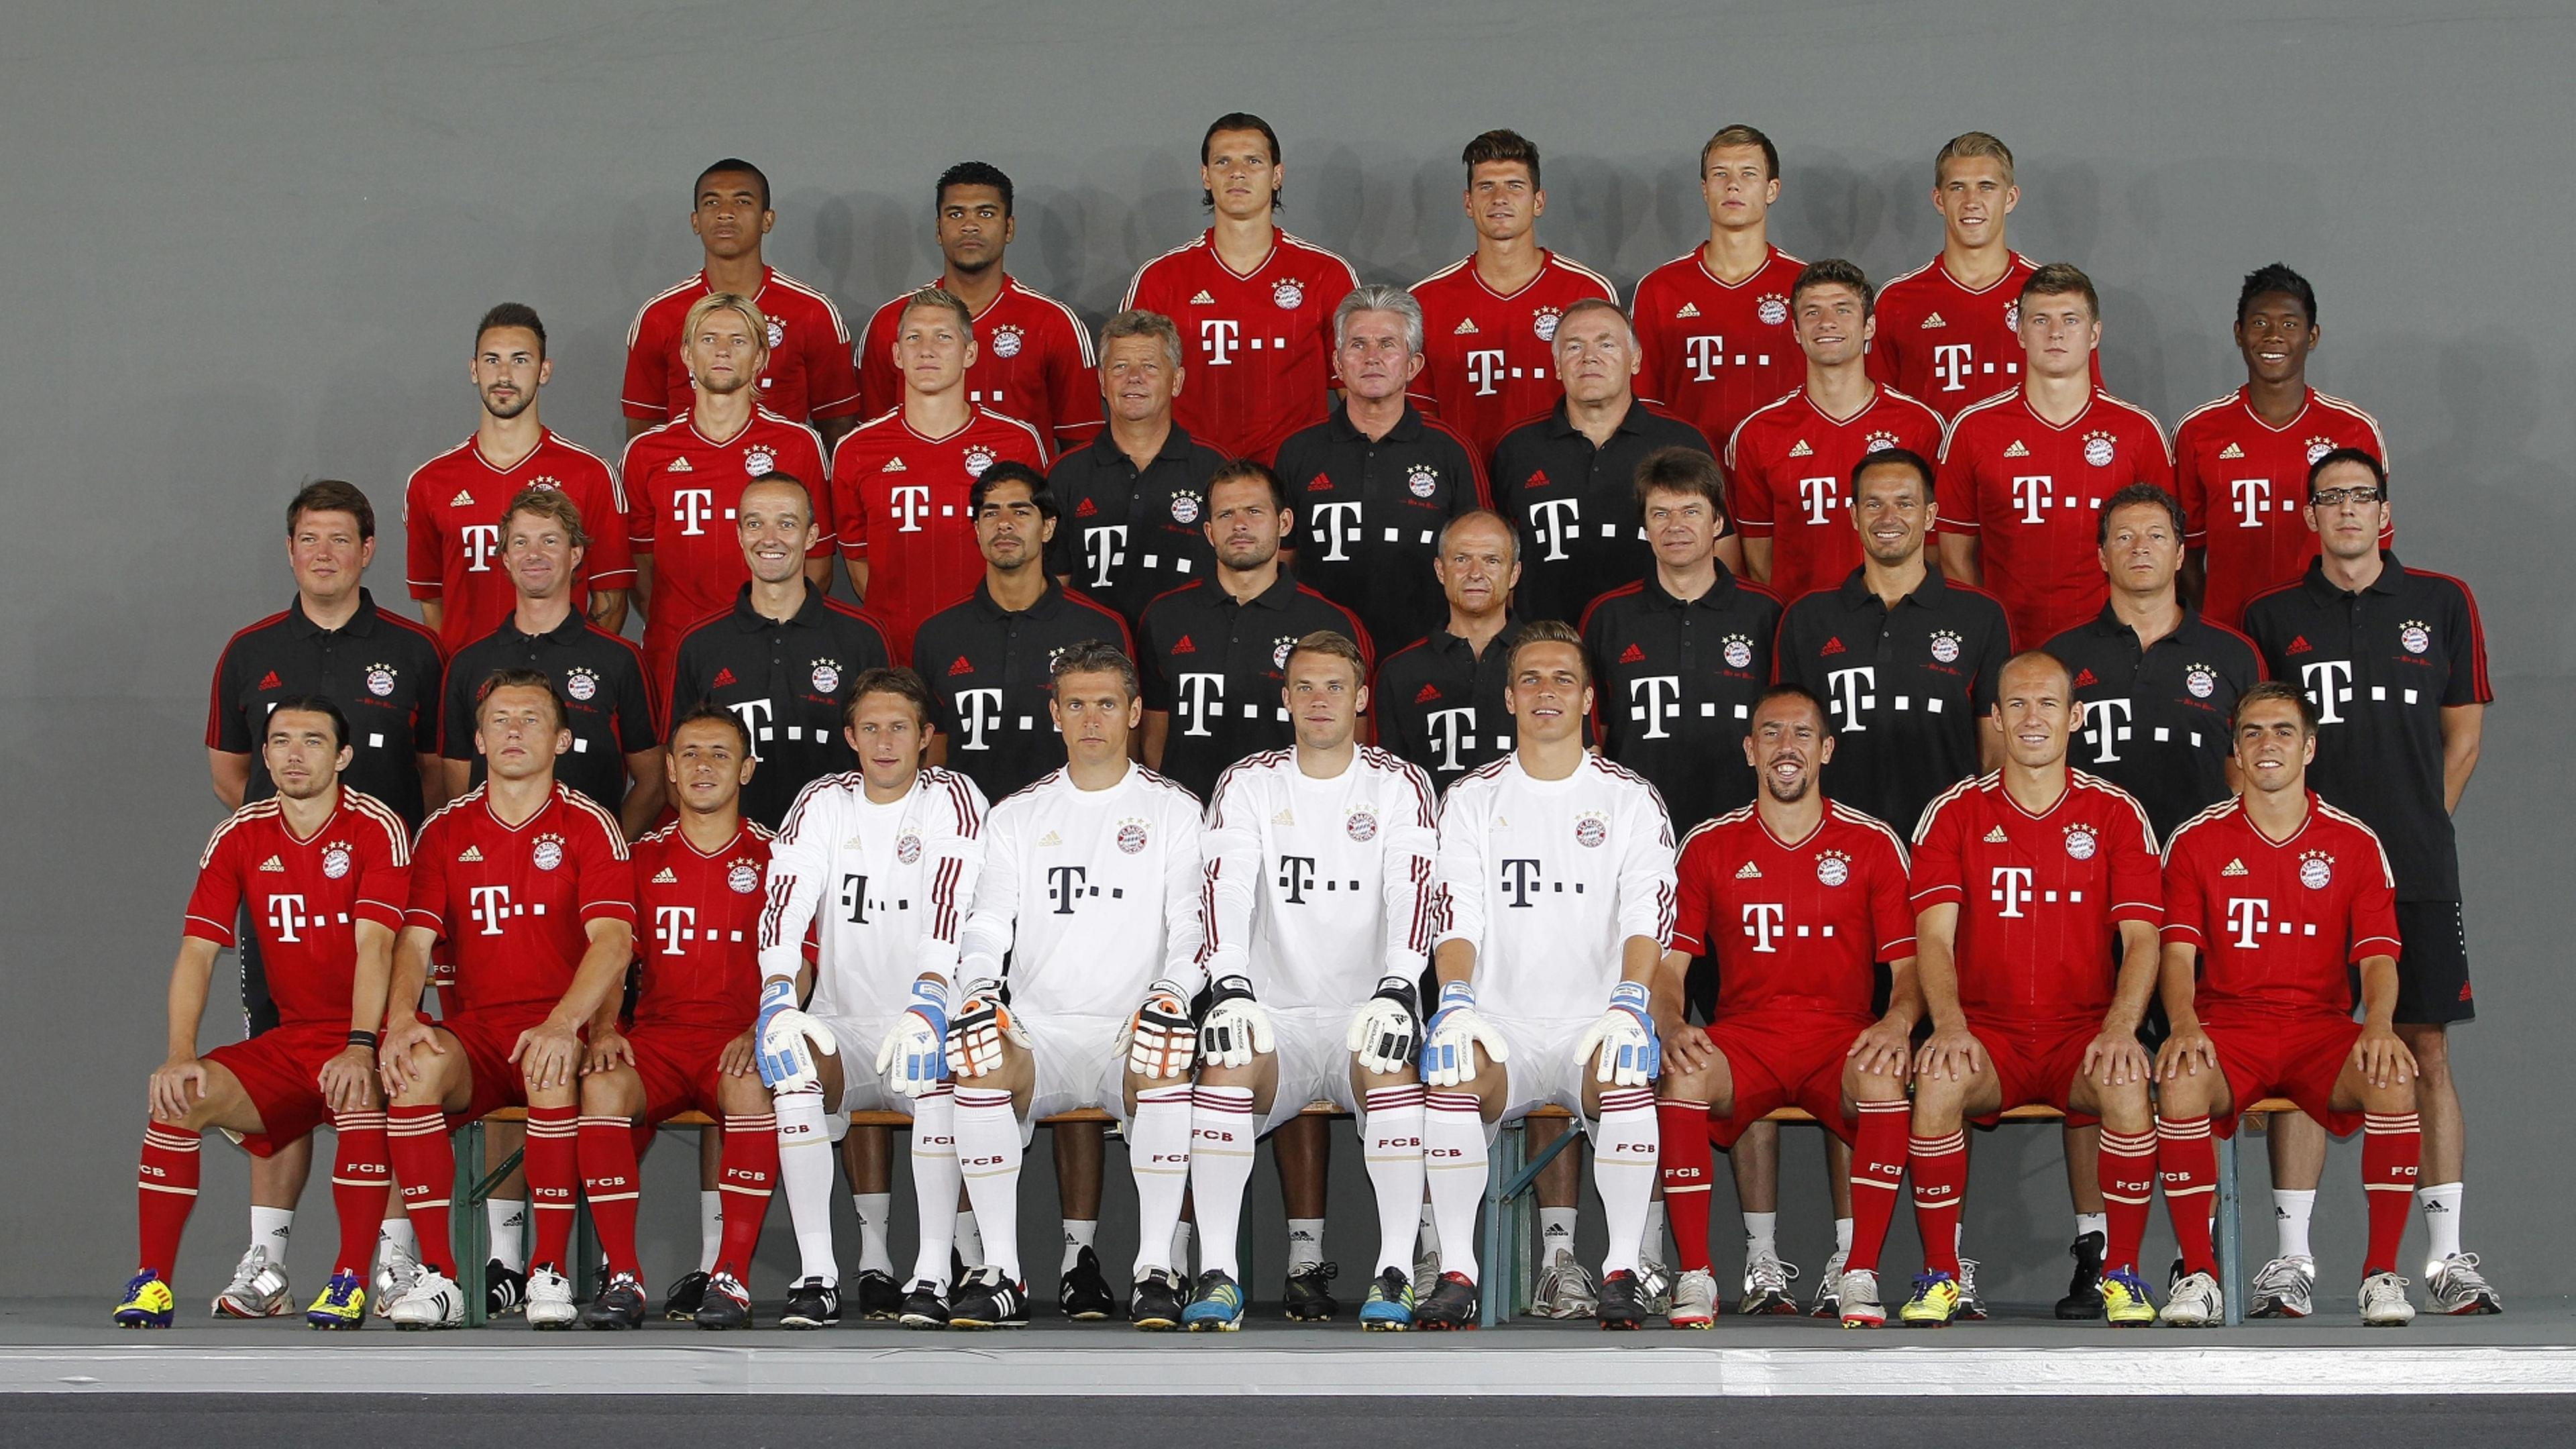 players of fc bayern munchen team wallpaper download 3840x2160